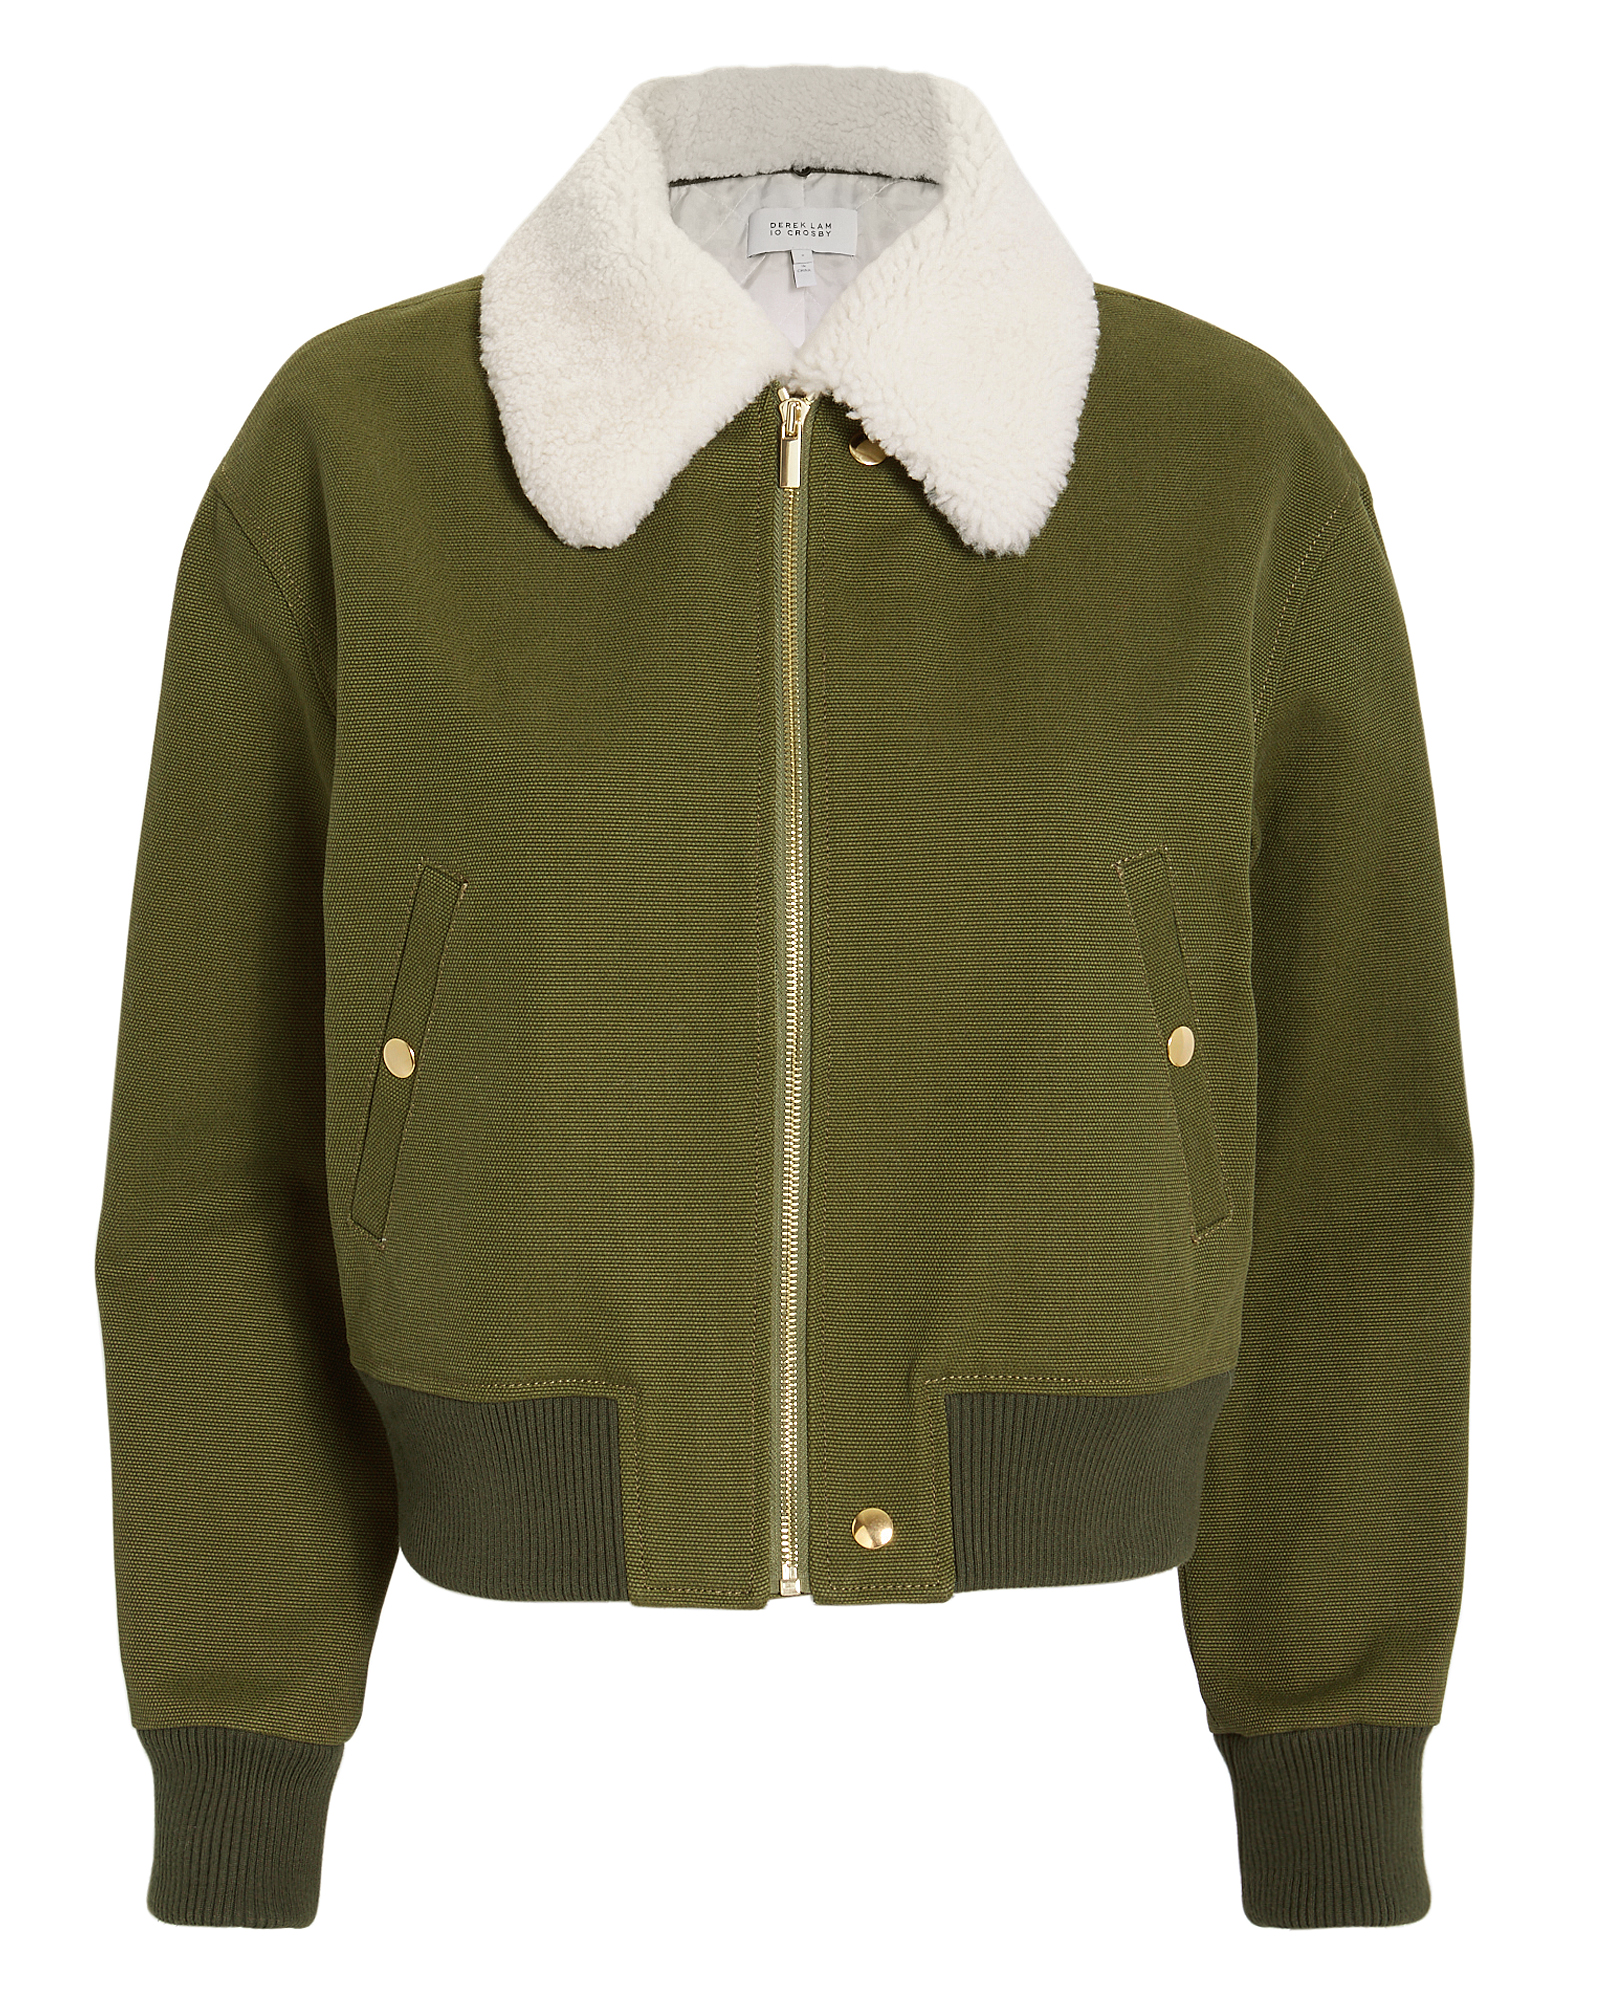 10 CROSBY Shearling Collar Army Green Bomber Jacket